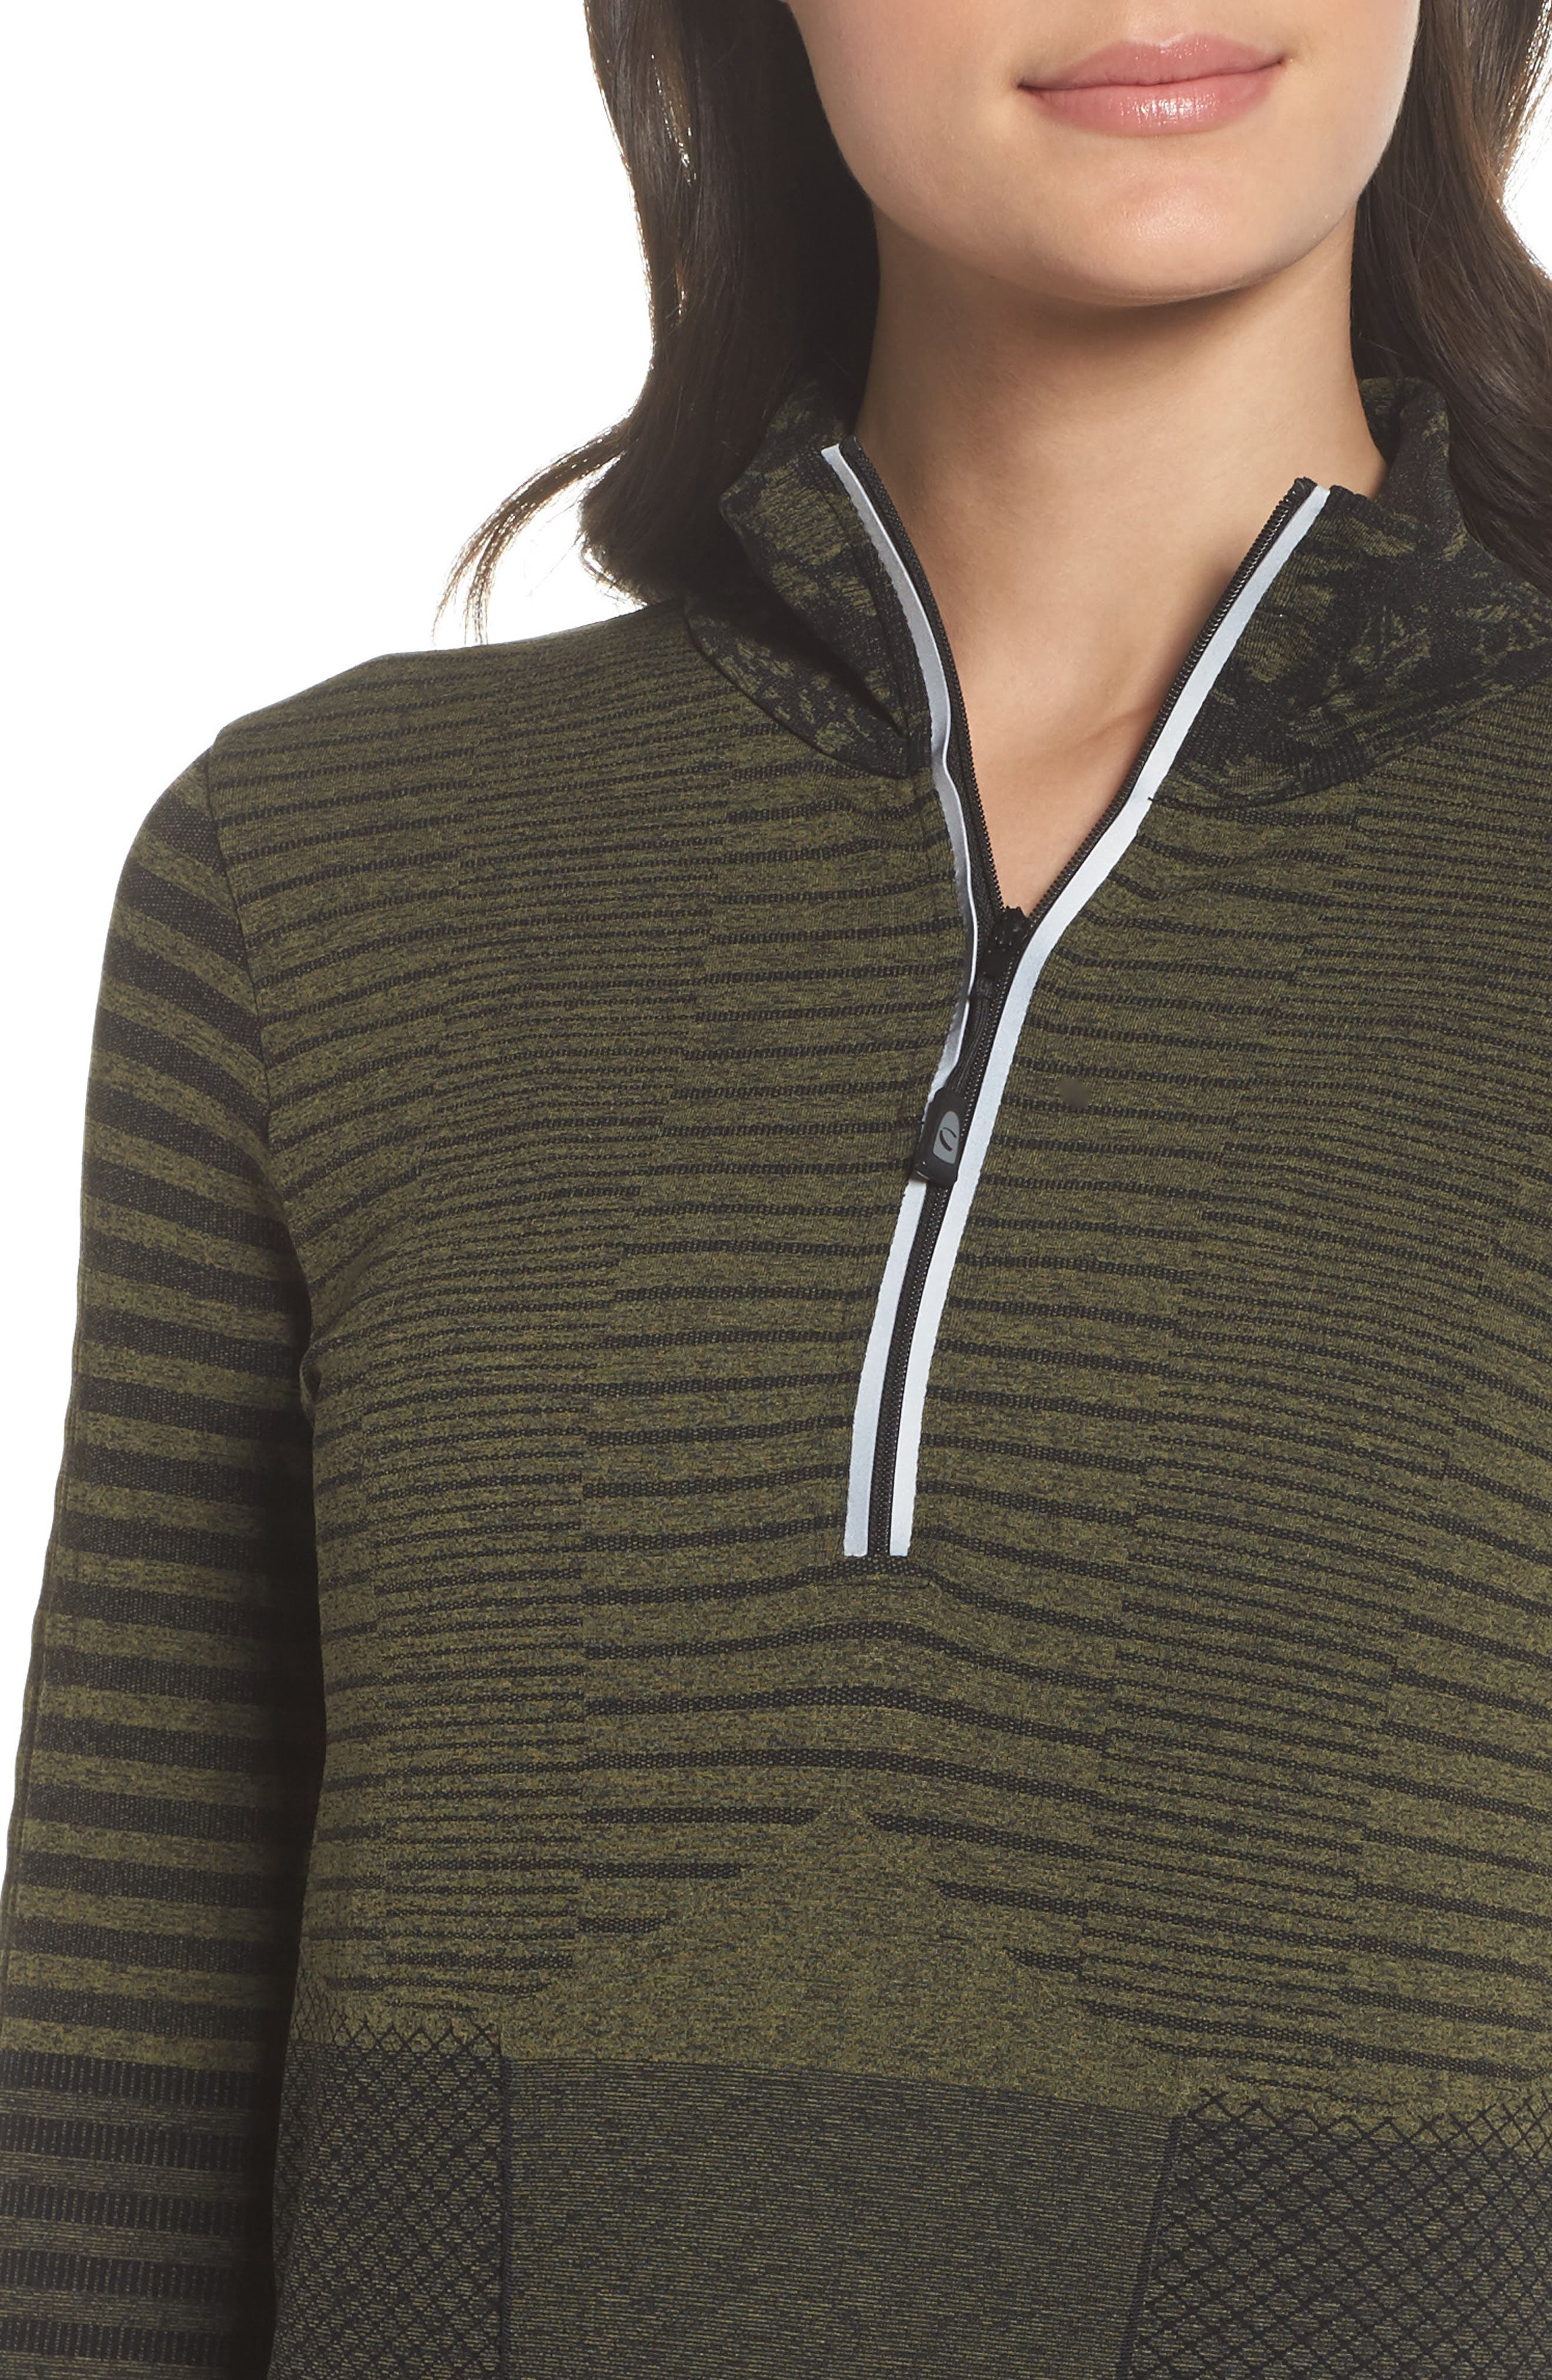 Vitality Quarter Zip Pullover,                             Alternate thumbnail 4, color,                             Deep Lichen Green/ Black